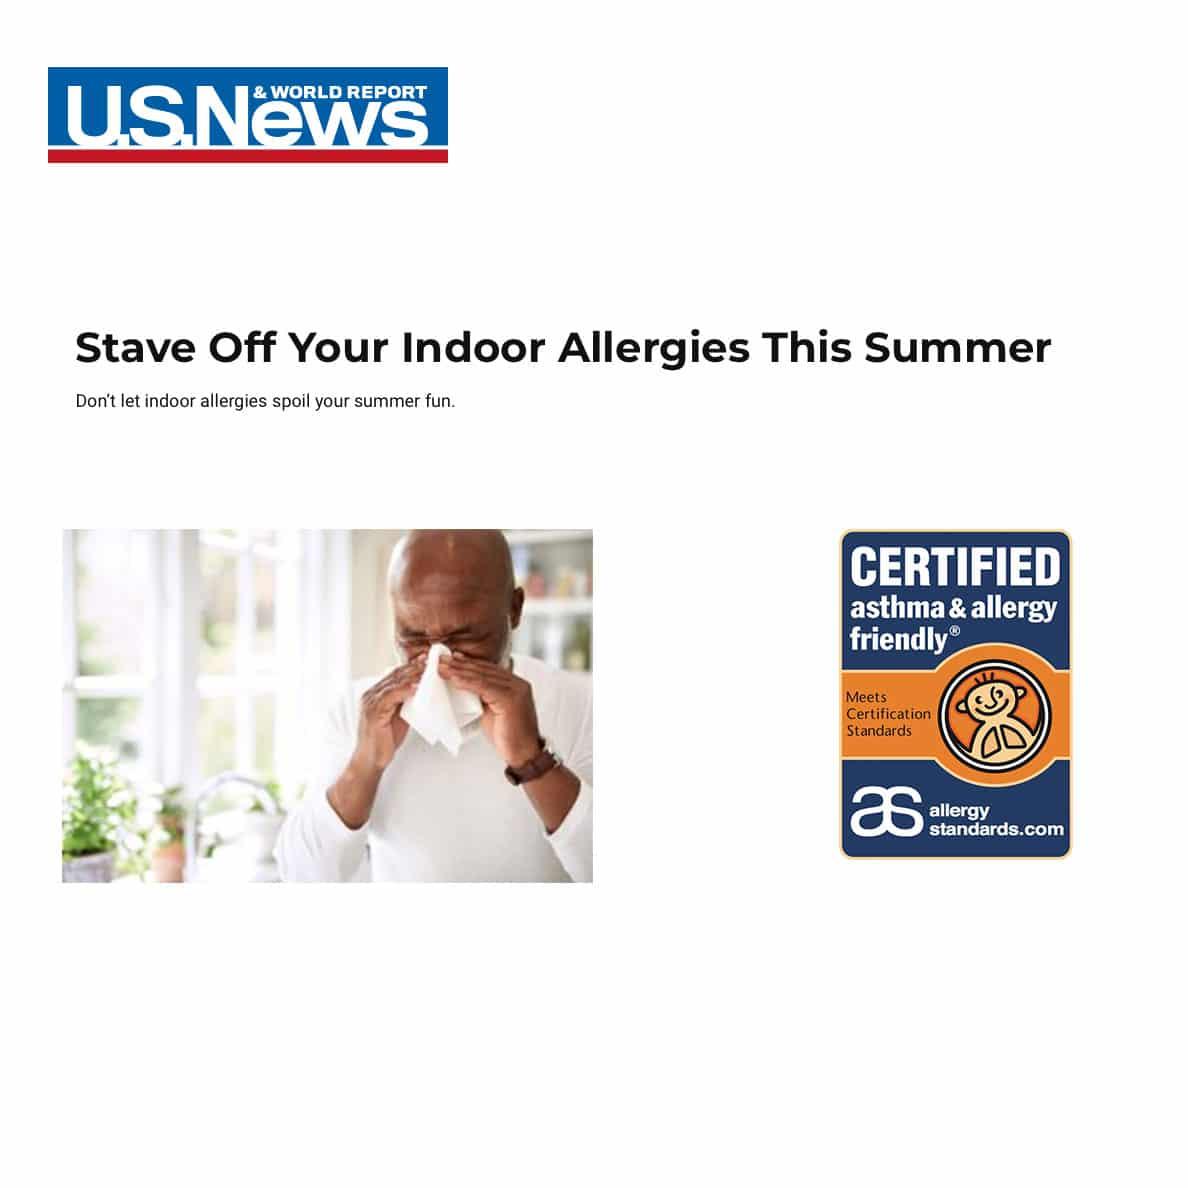 US-News-Health-Indoor-Air-Allergies-Summer-Allergy-Standards